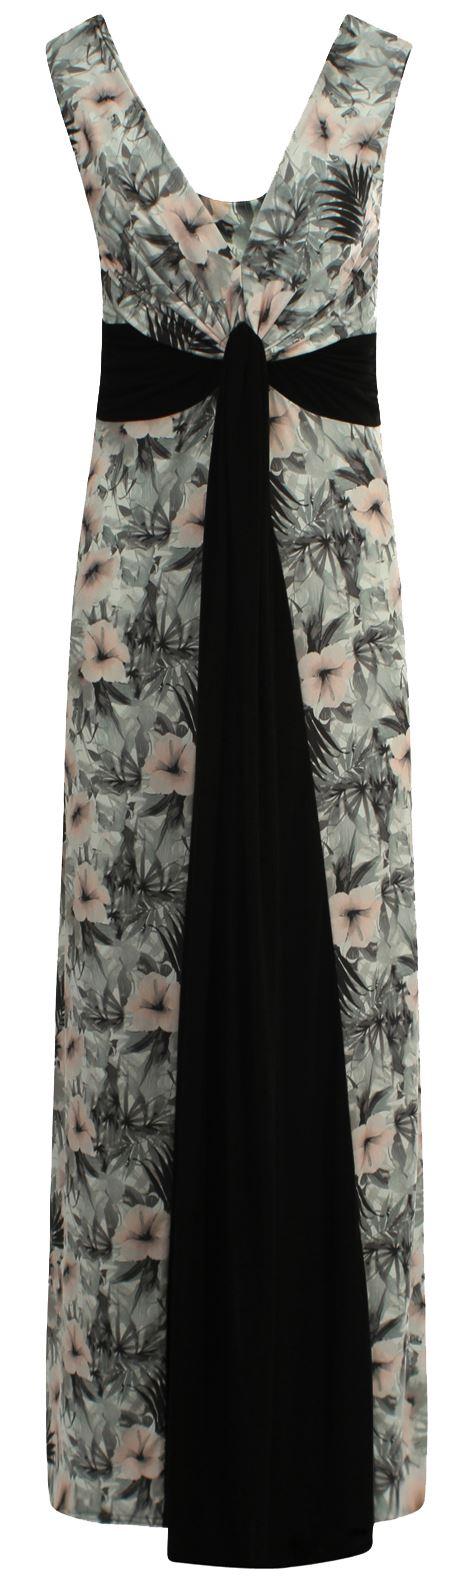 Womens Plus Size Grecian Boob Knot Contrast Panel Floral Print Summer Maxi Dress